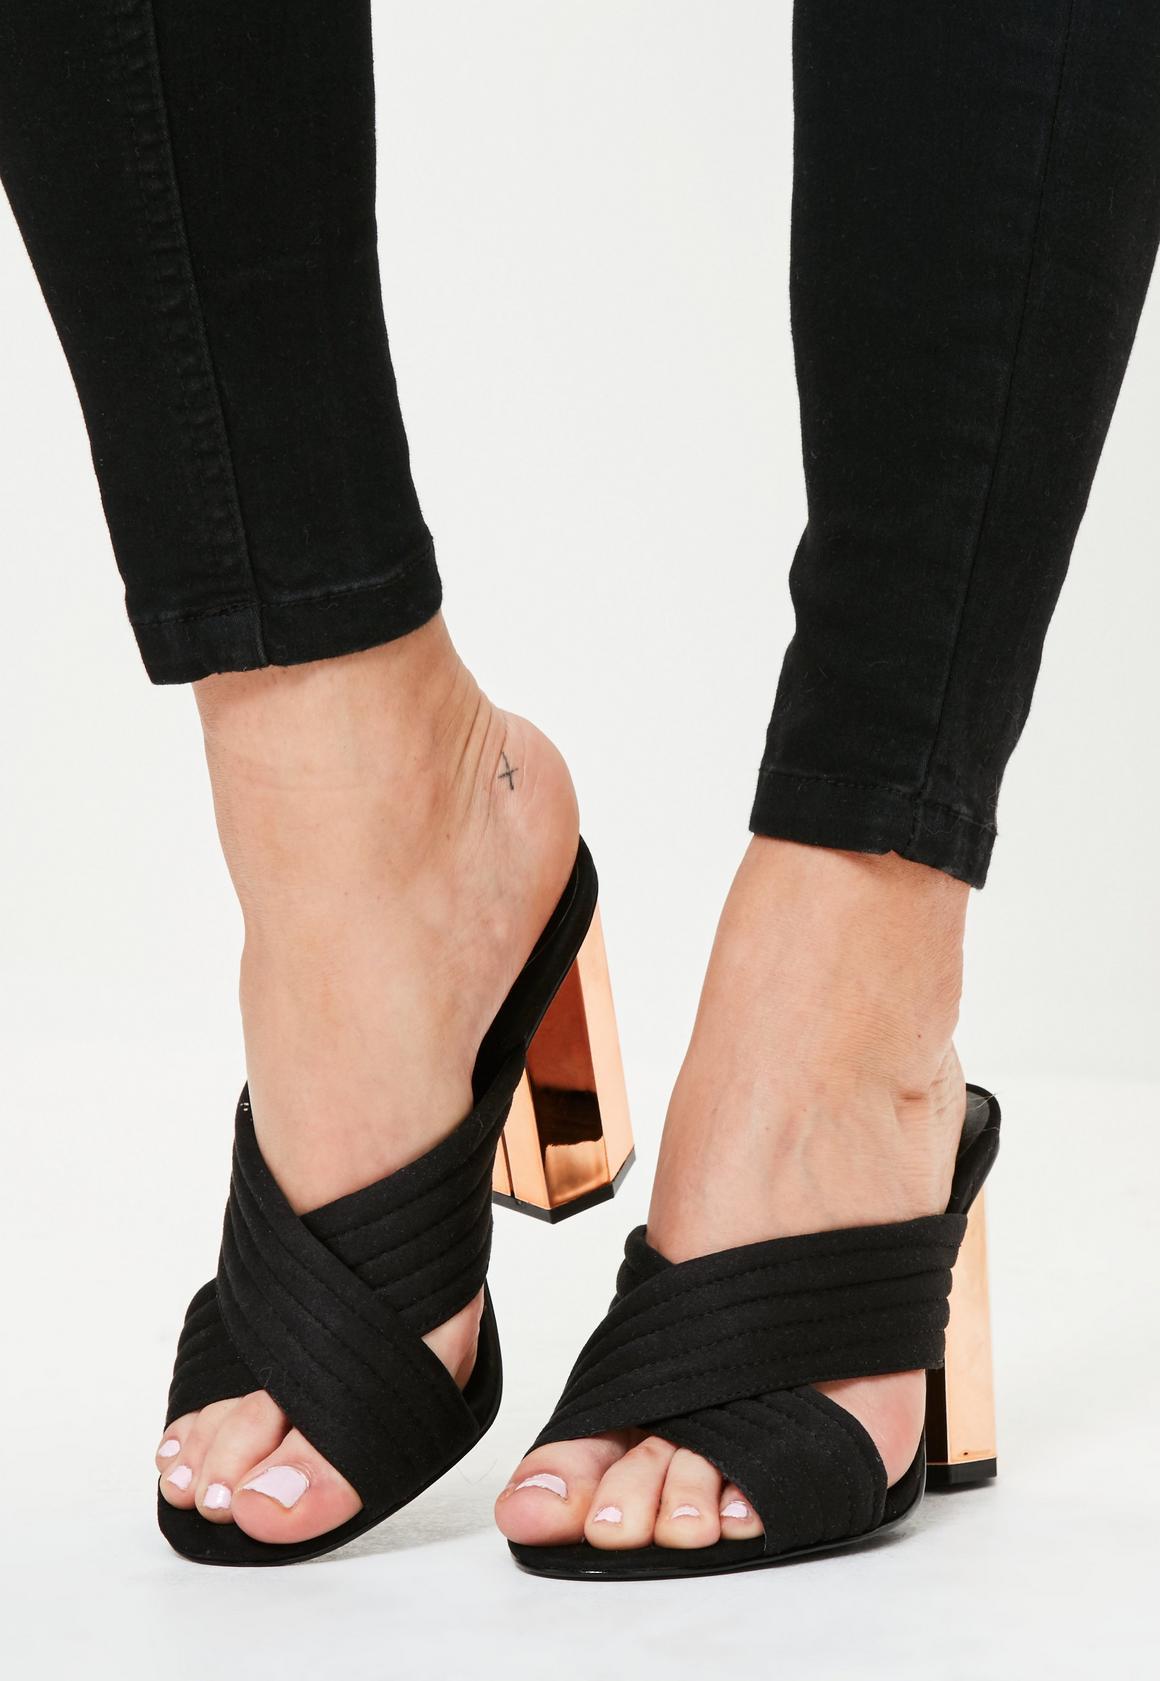 Black sandals missguided - Black Cross Strap Heels Mule Sandals Black Cross Strap Heels Mule Sandals